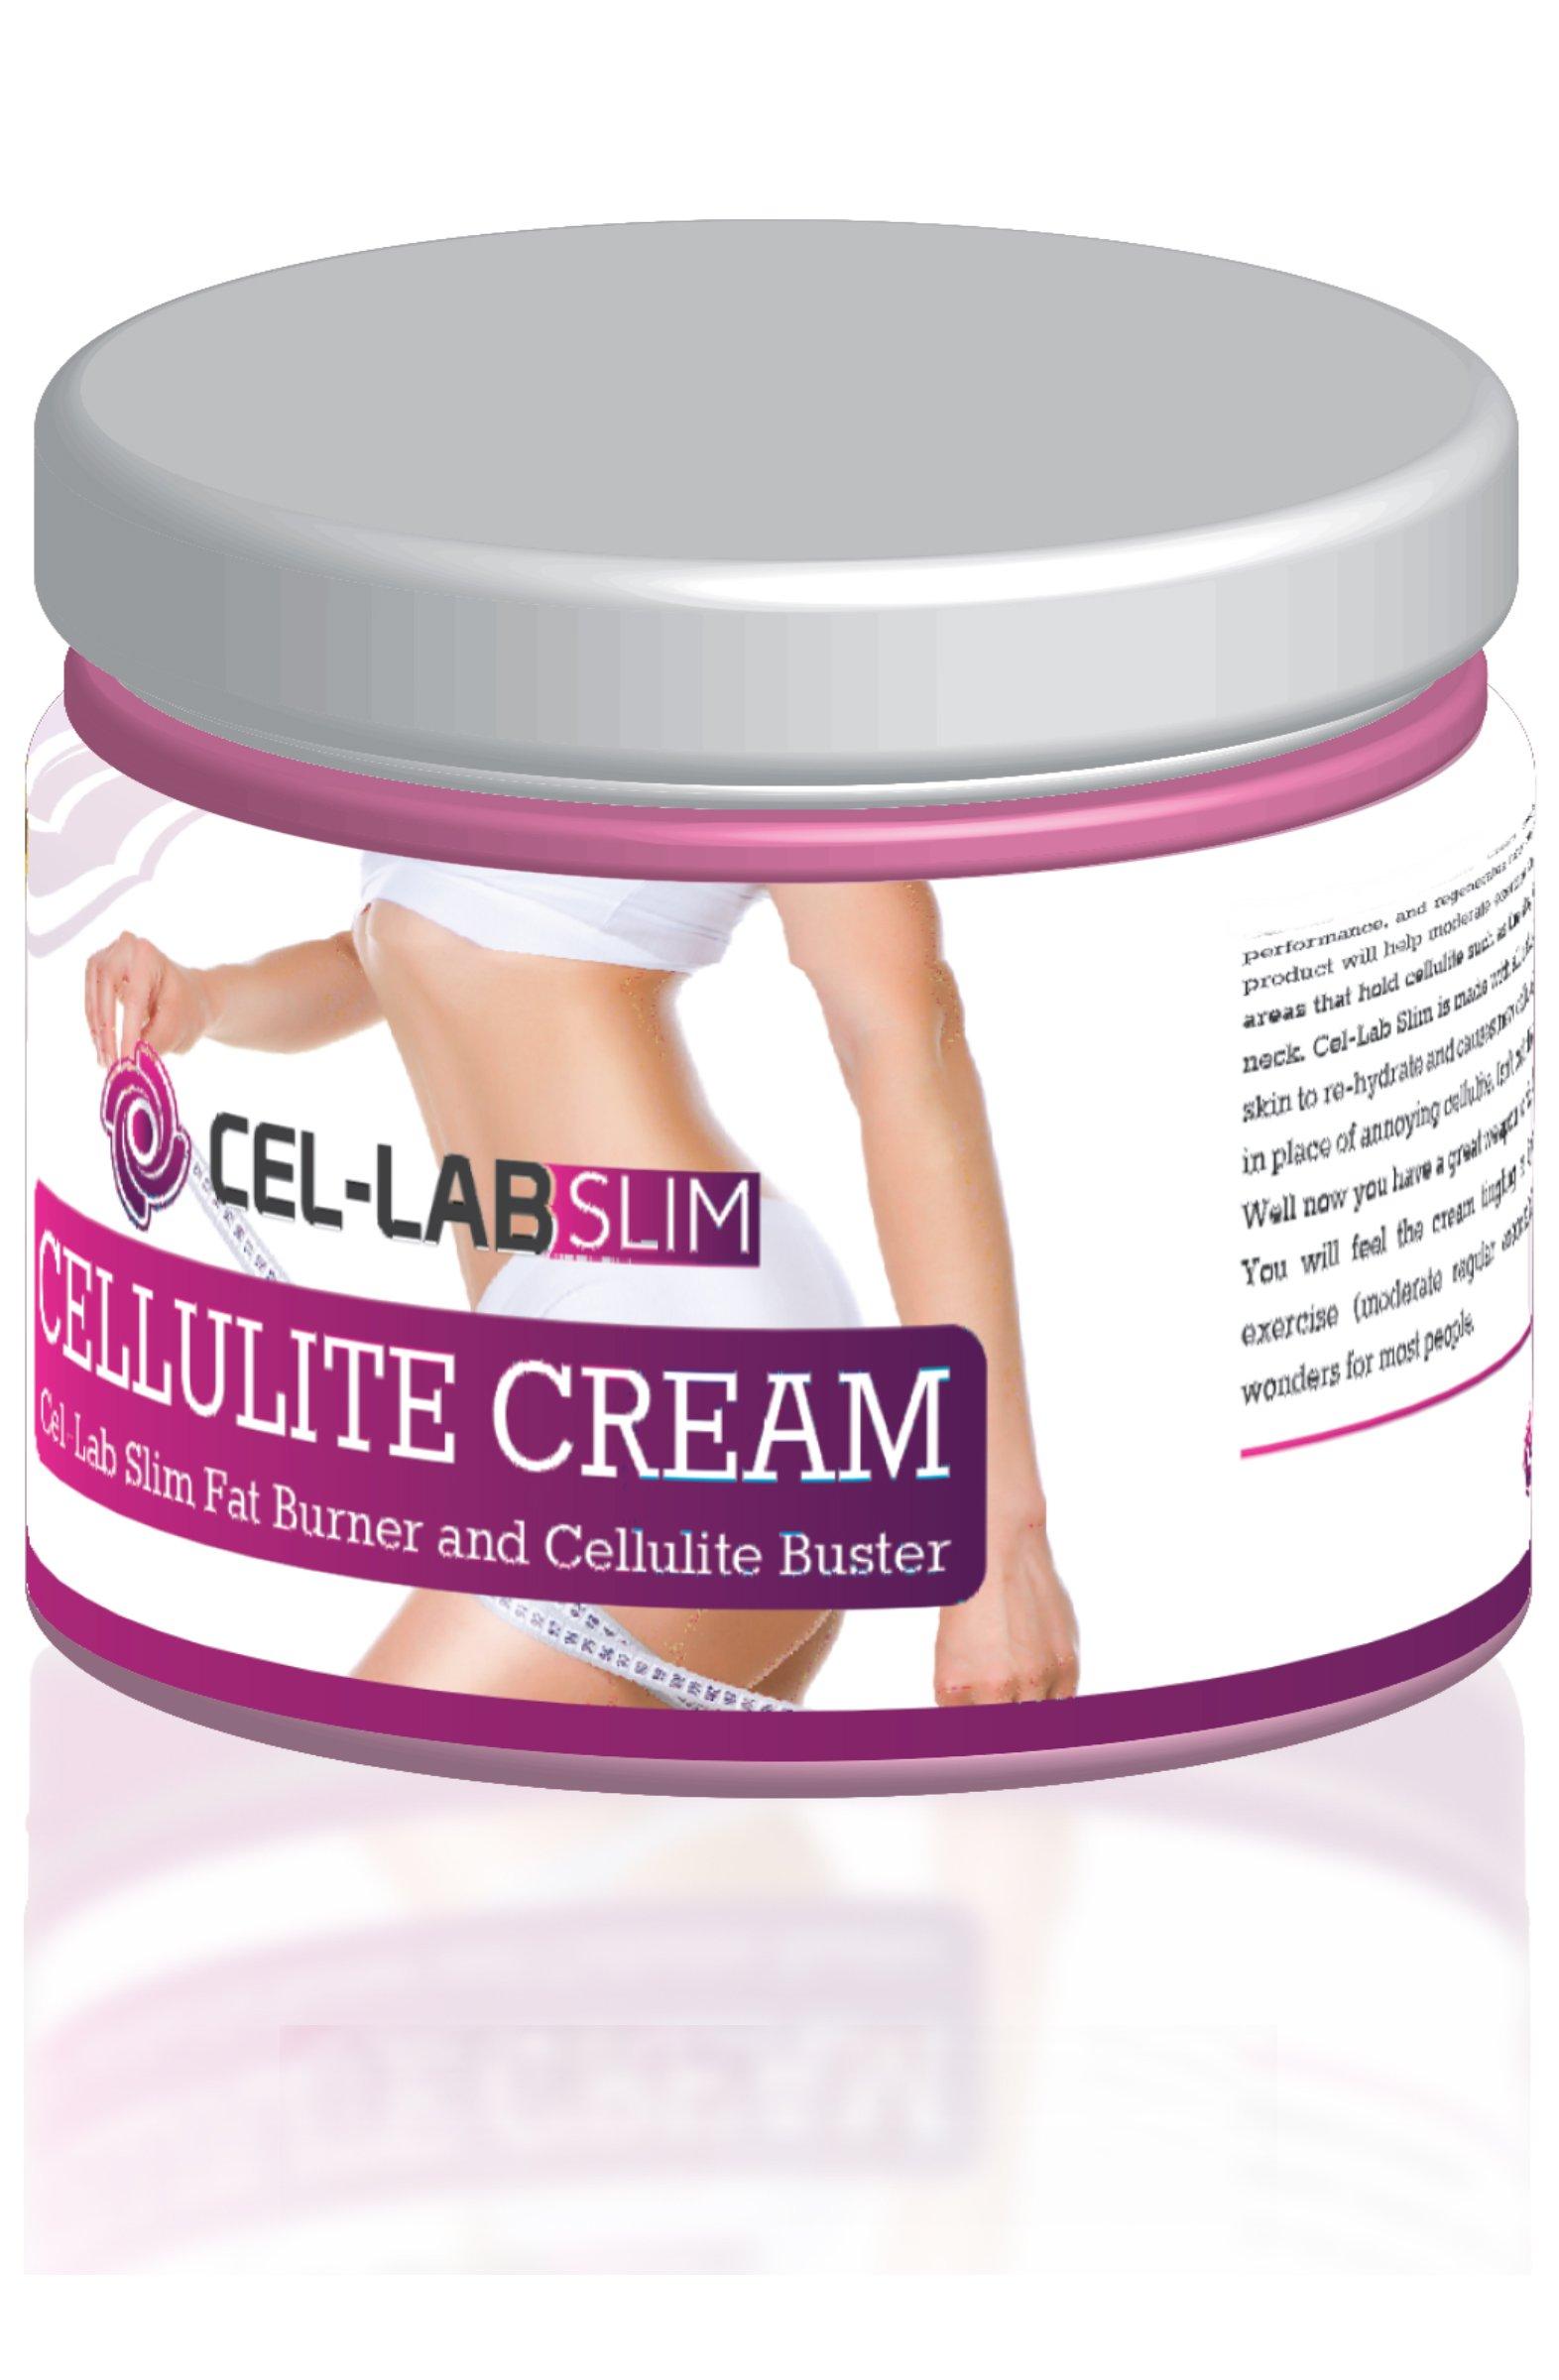 ALL NATURAL CELLULITE CREAM 6.7 oz 200ml CEL-LAB SLIM Slimming Cream Potent Skin-Firming Anti-Cellulite Formula |